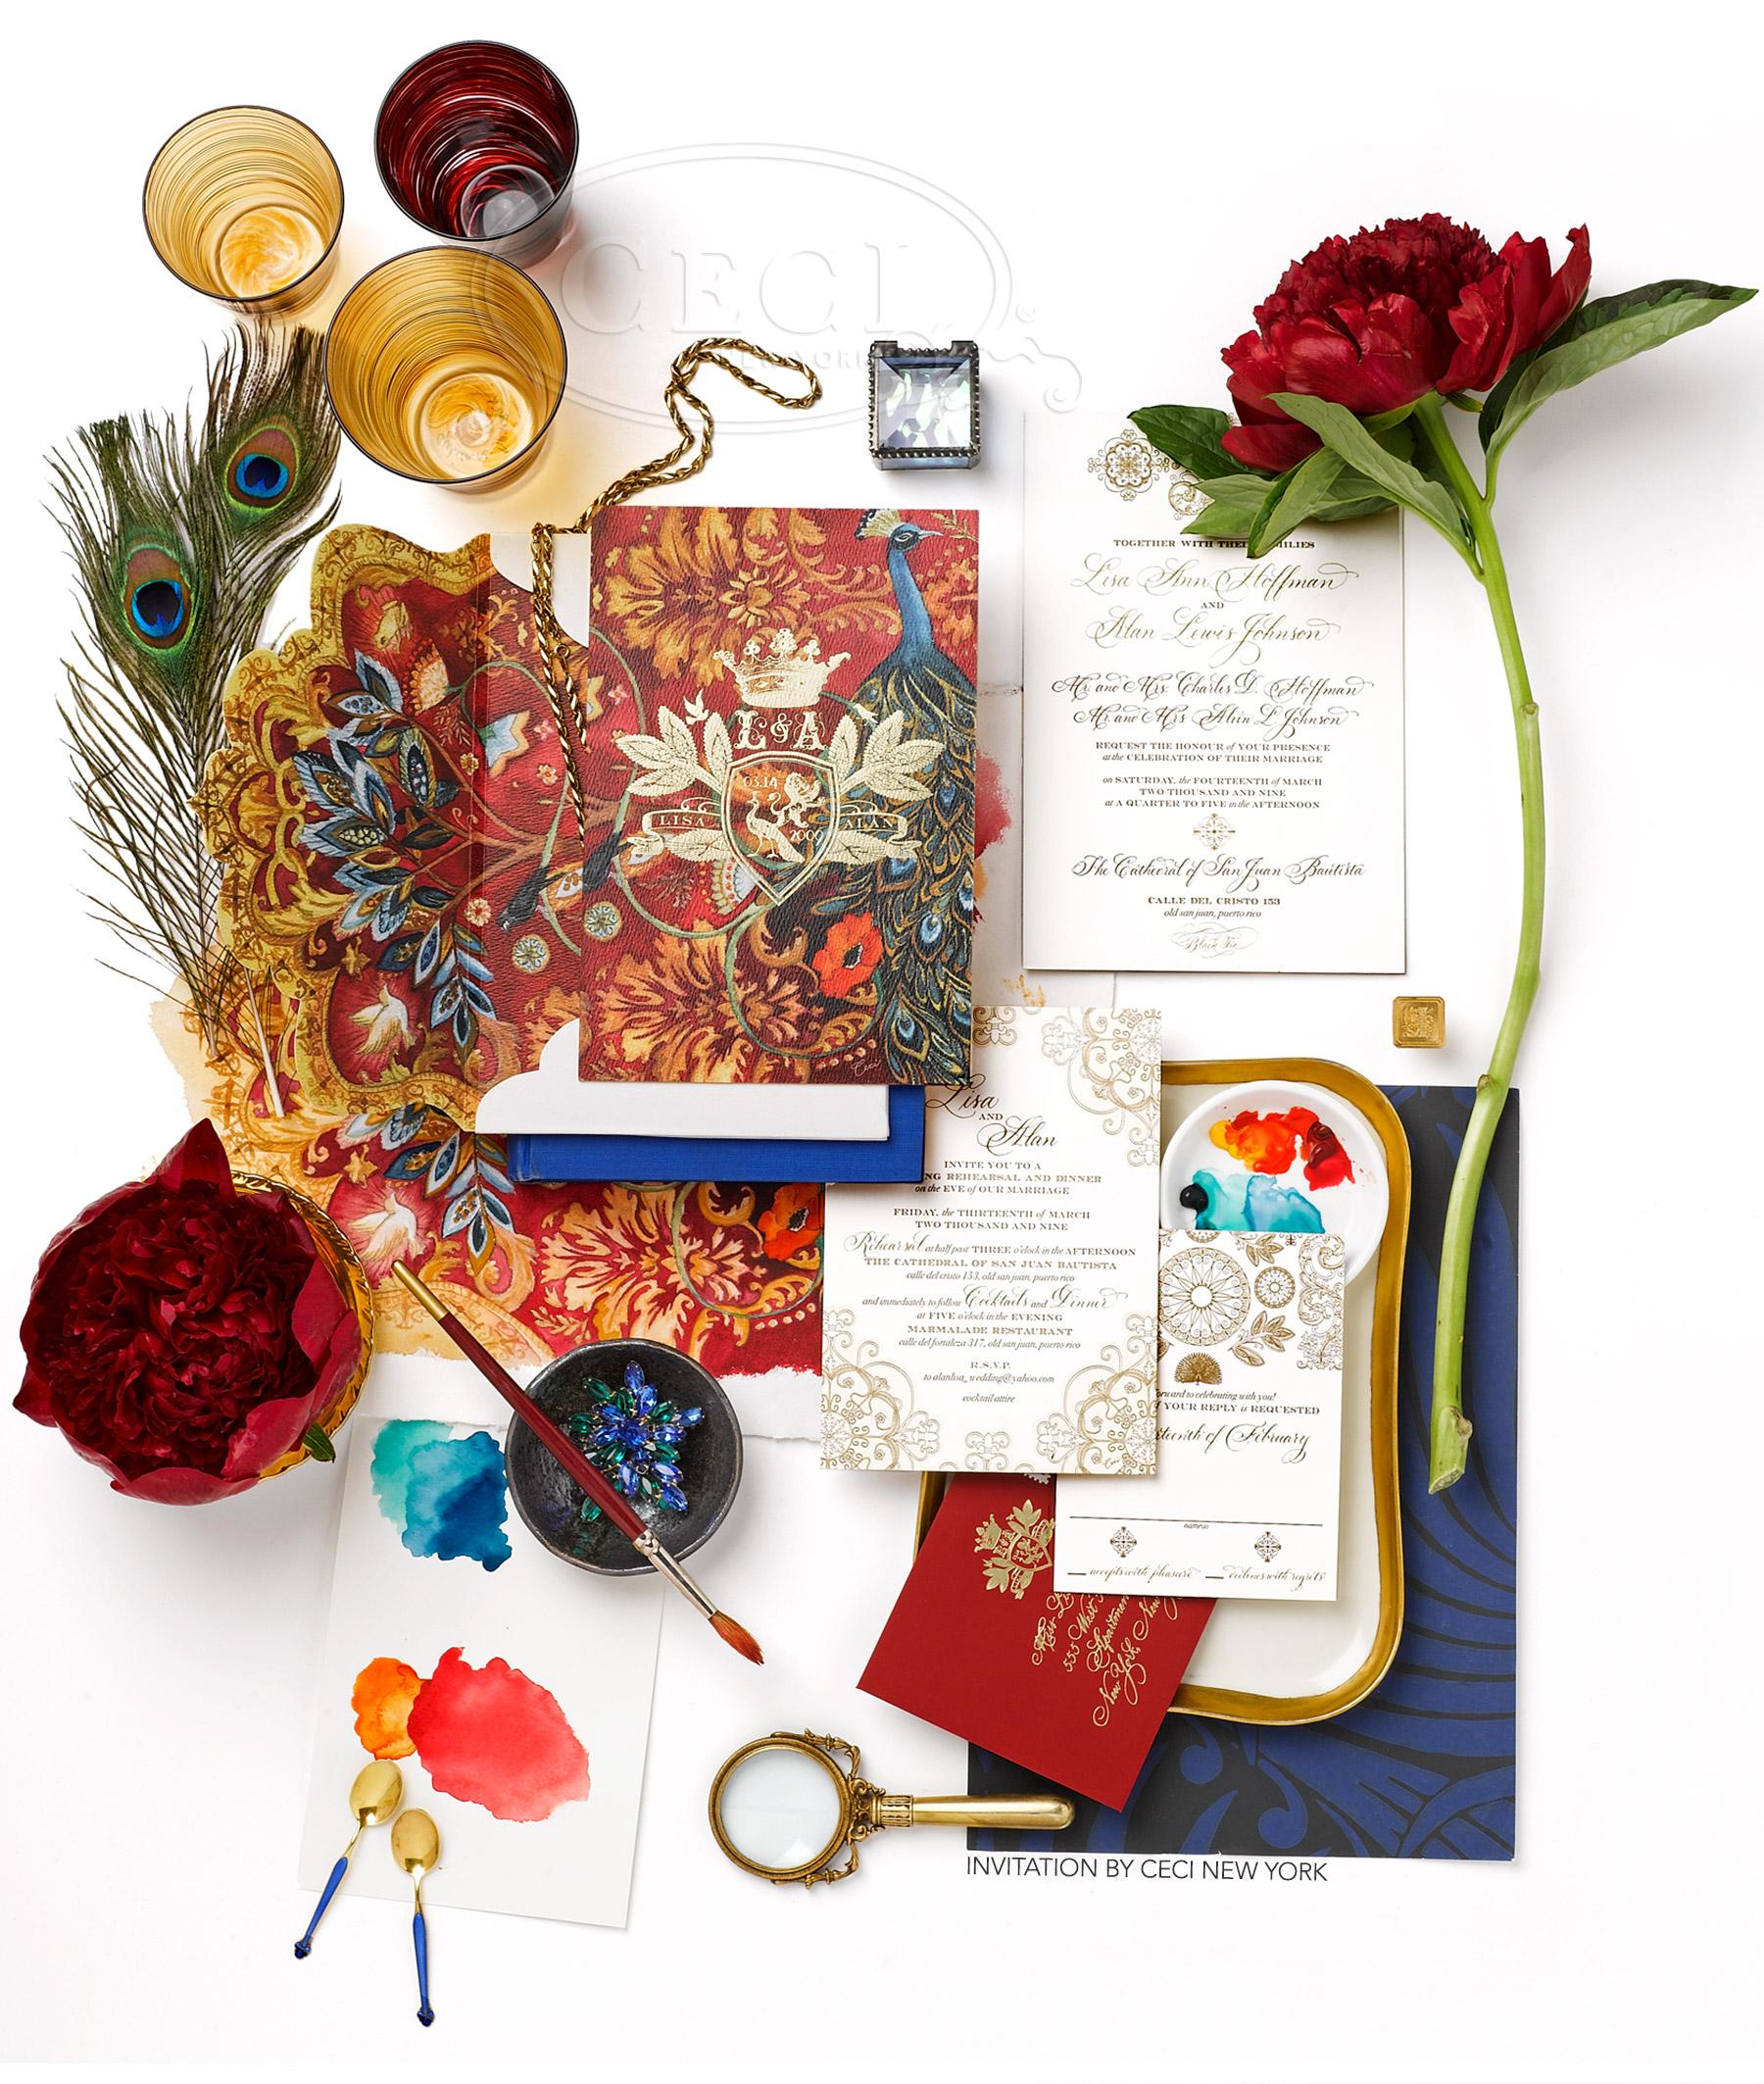 spanish wedding spanish wedding invitations Talavera Wedding Suite Spanish Tile Invitations Save the dates citlalicreativo com